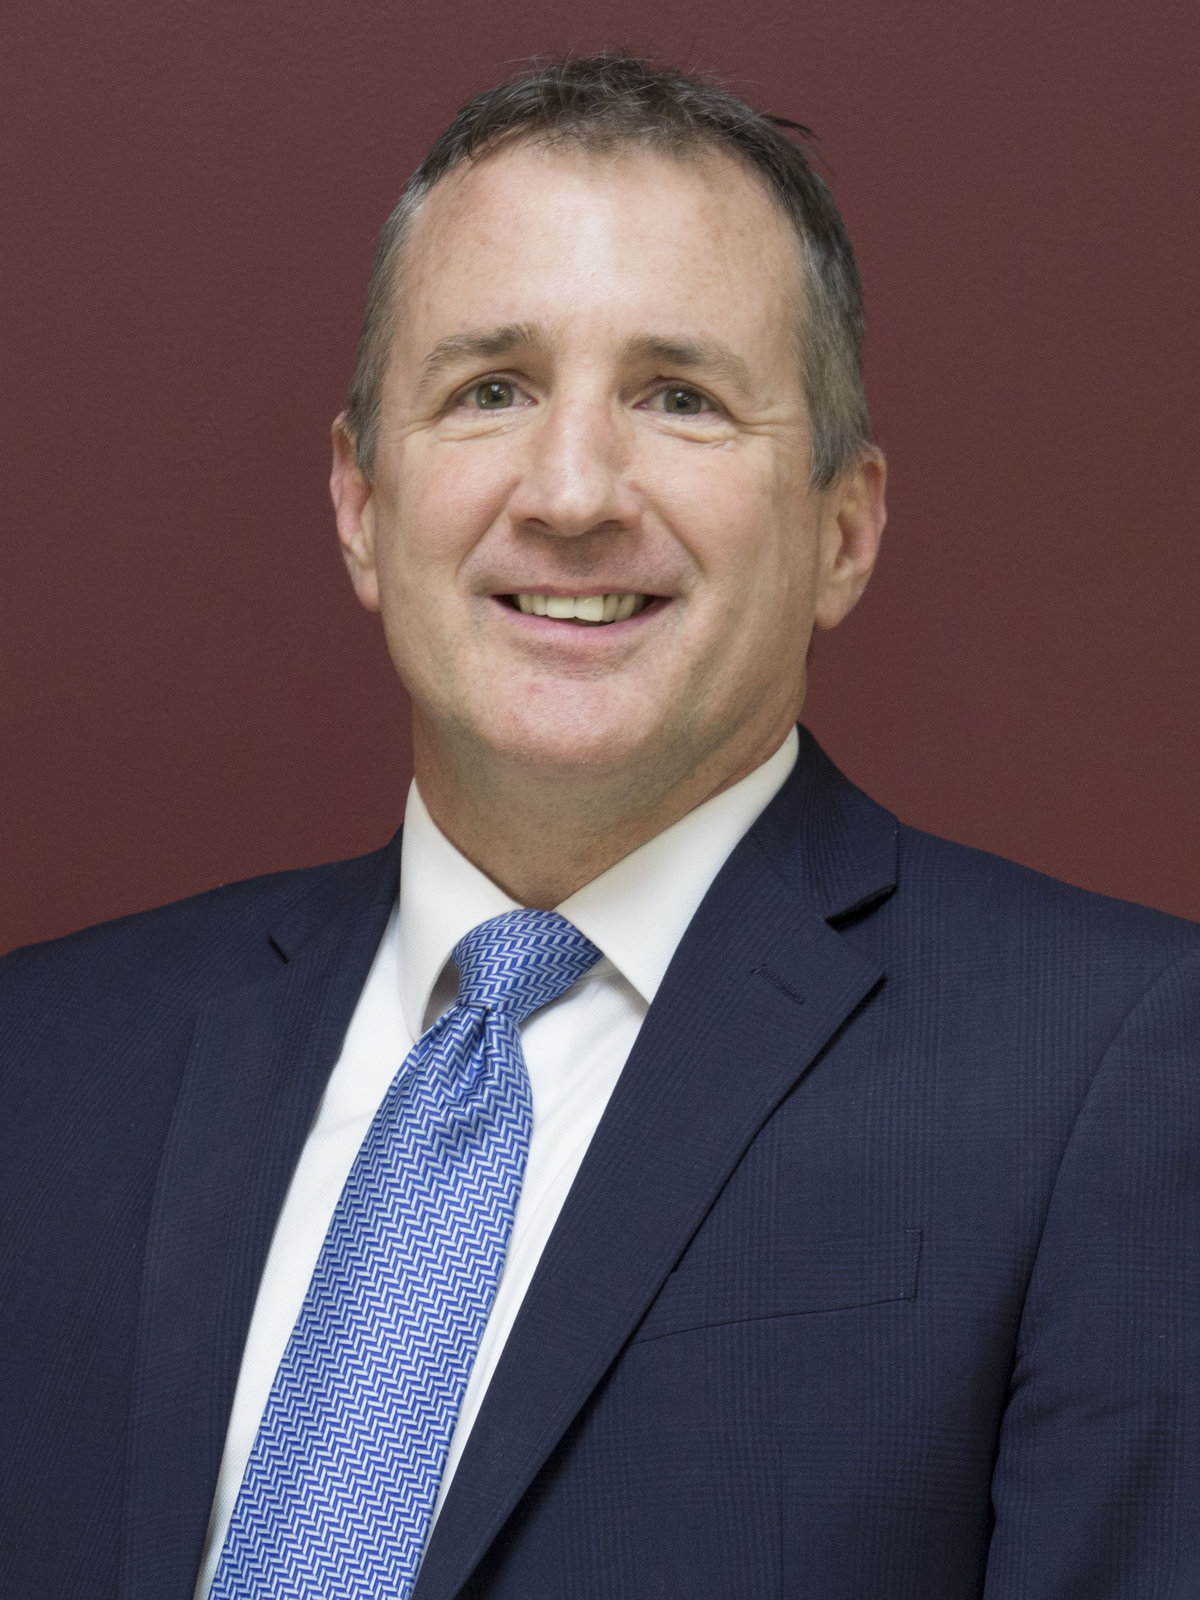 Scott Mundell Joins Duneland Family YMCA Board of Directors